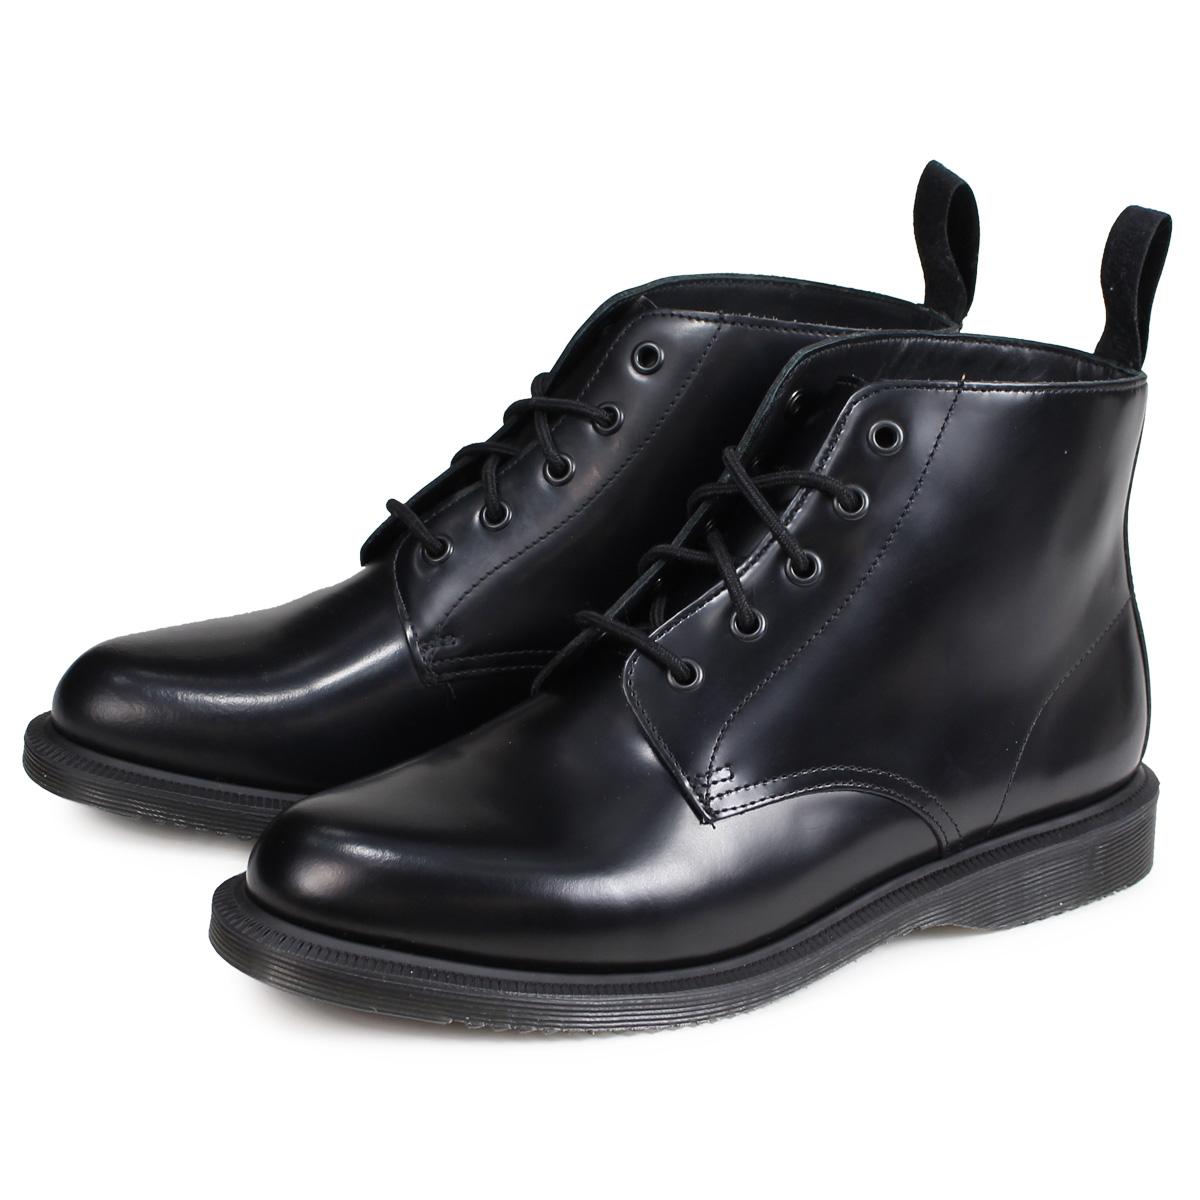 Dr.Martens EMMELINE KENSINGTON 5EYE BOOT ドクターマーチン 5ホール ブーツ メンズ レディース ブラック R16701001